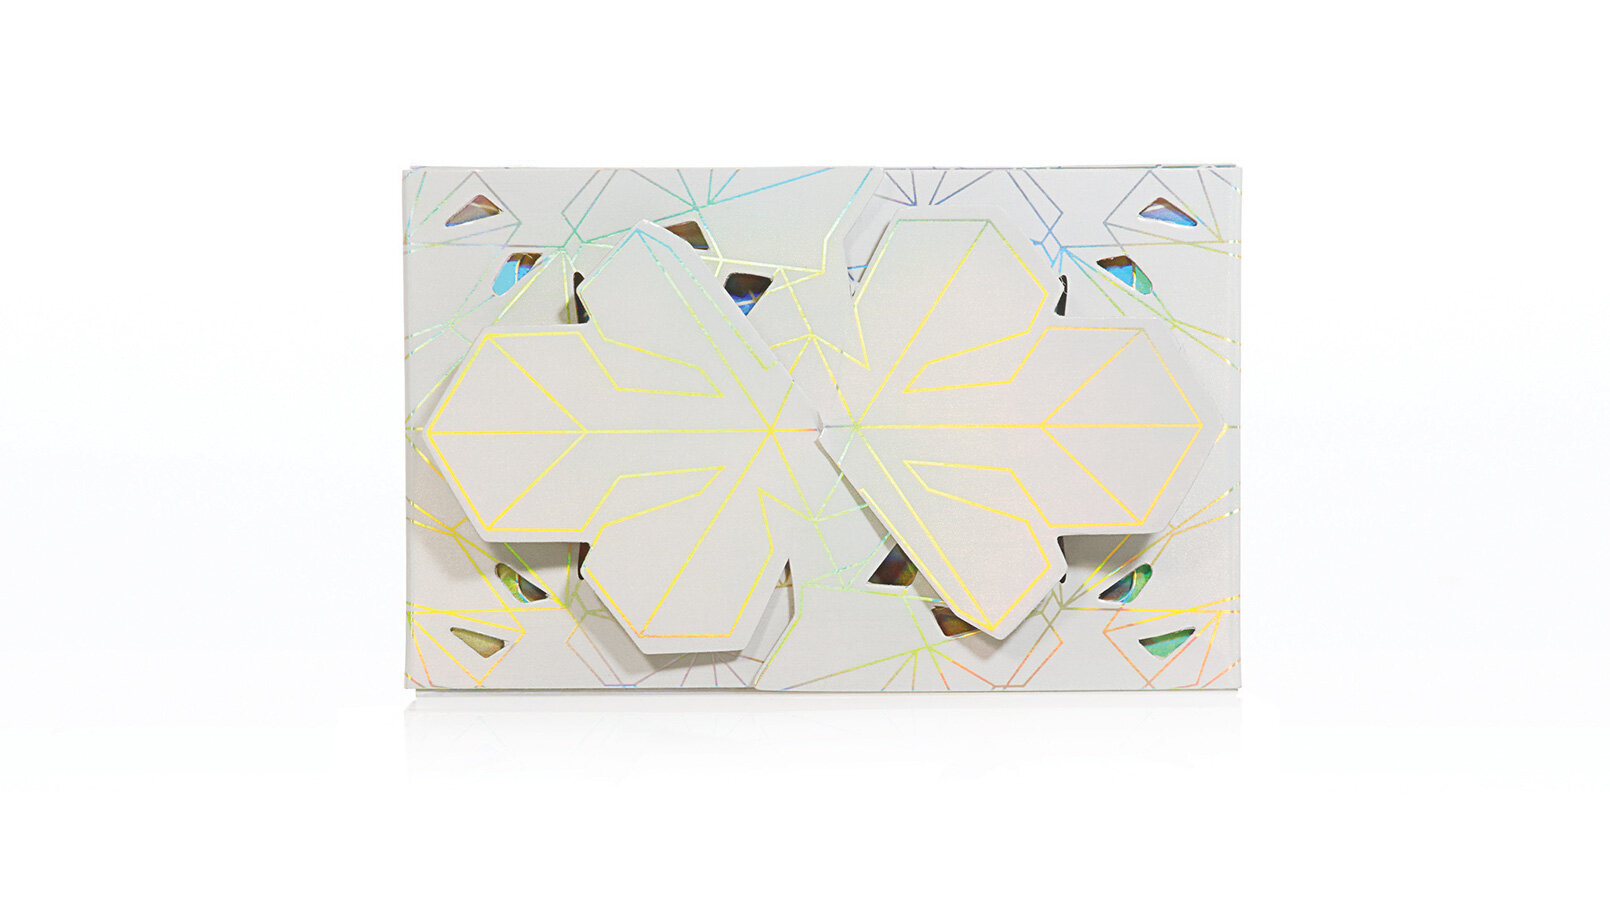 Sephora-snowflake-holiday-gift-card-packaging-company-design-4.jpg